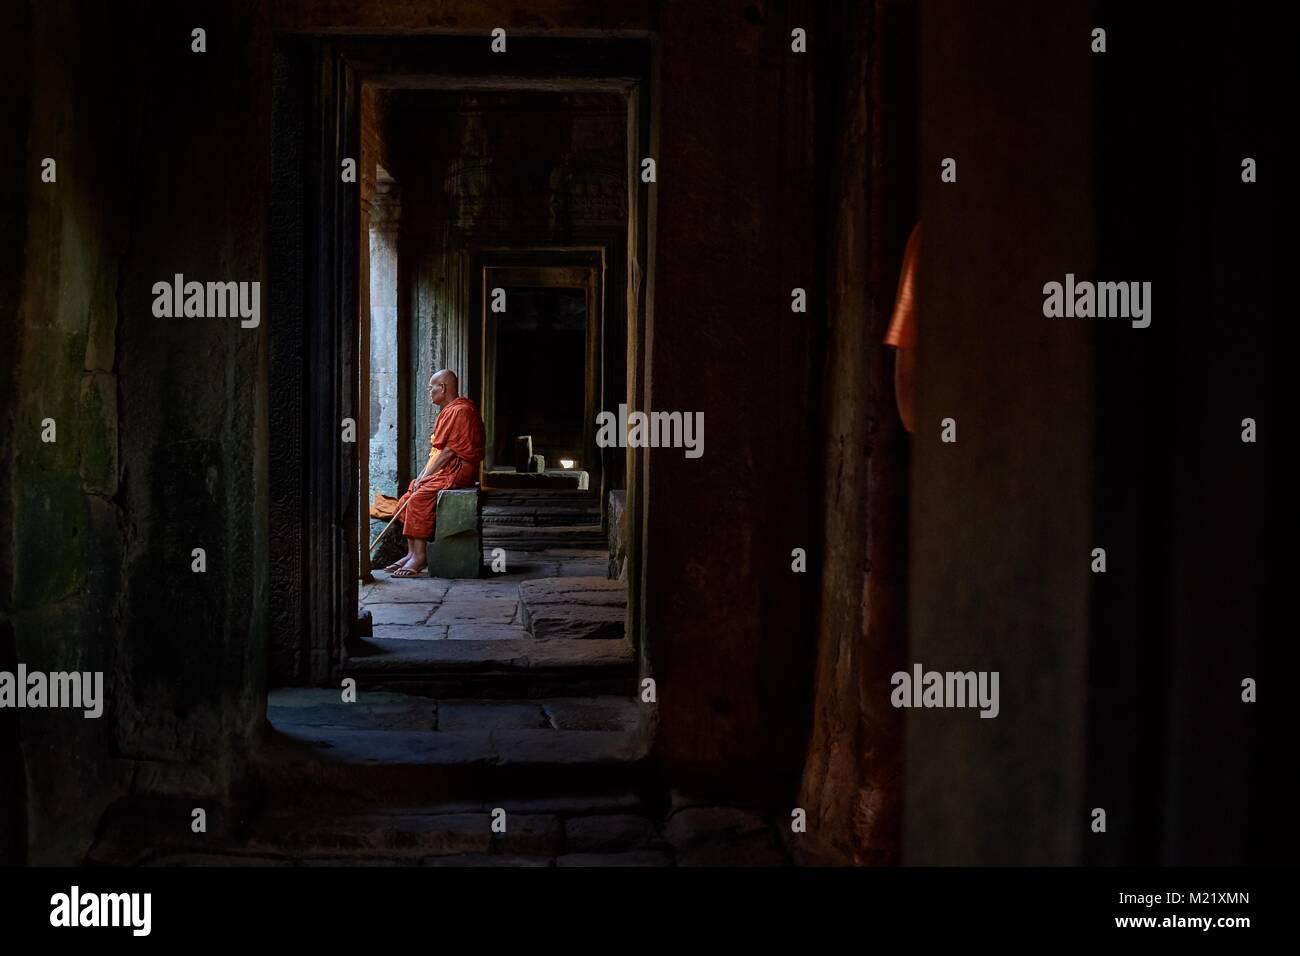 Old buddhist monk, Bayon Temple, Angkor, Cambodia - Stock Image